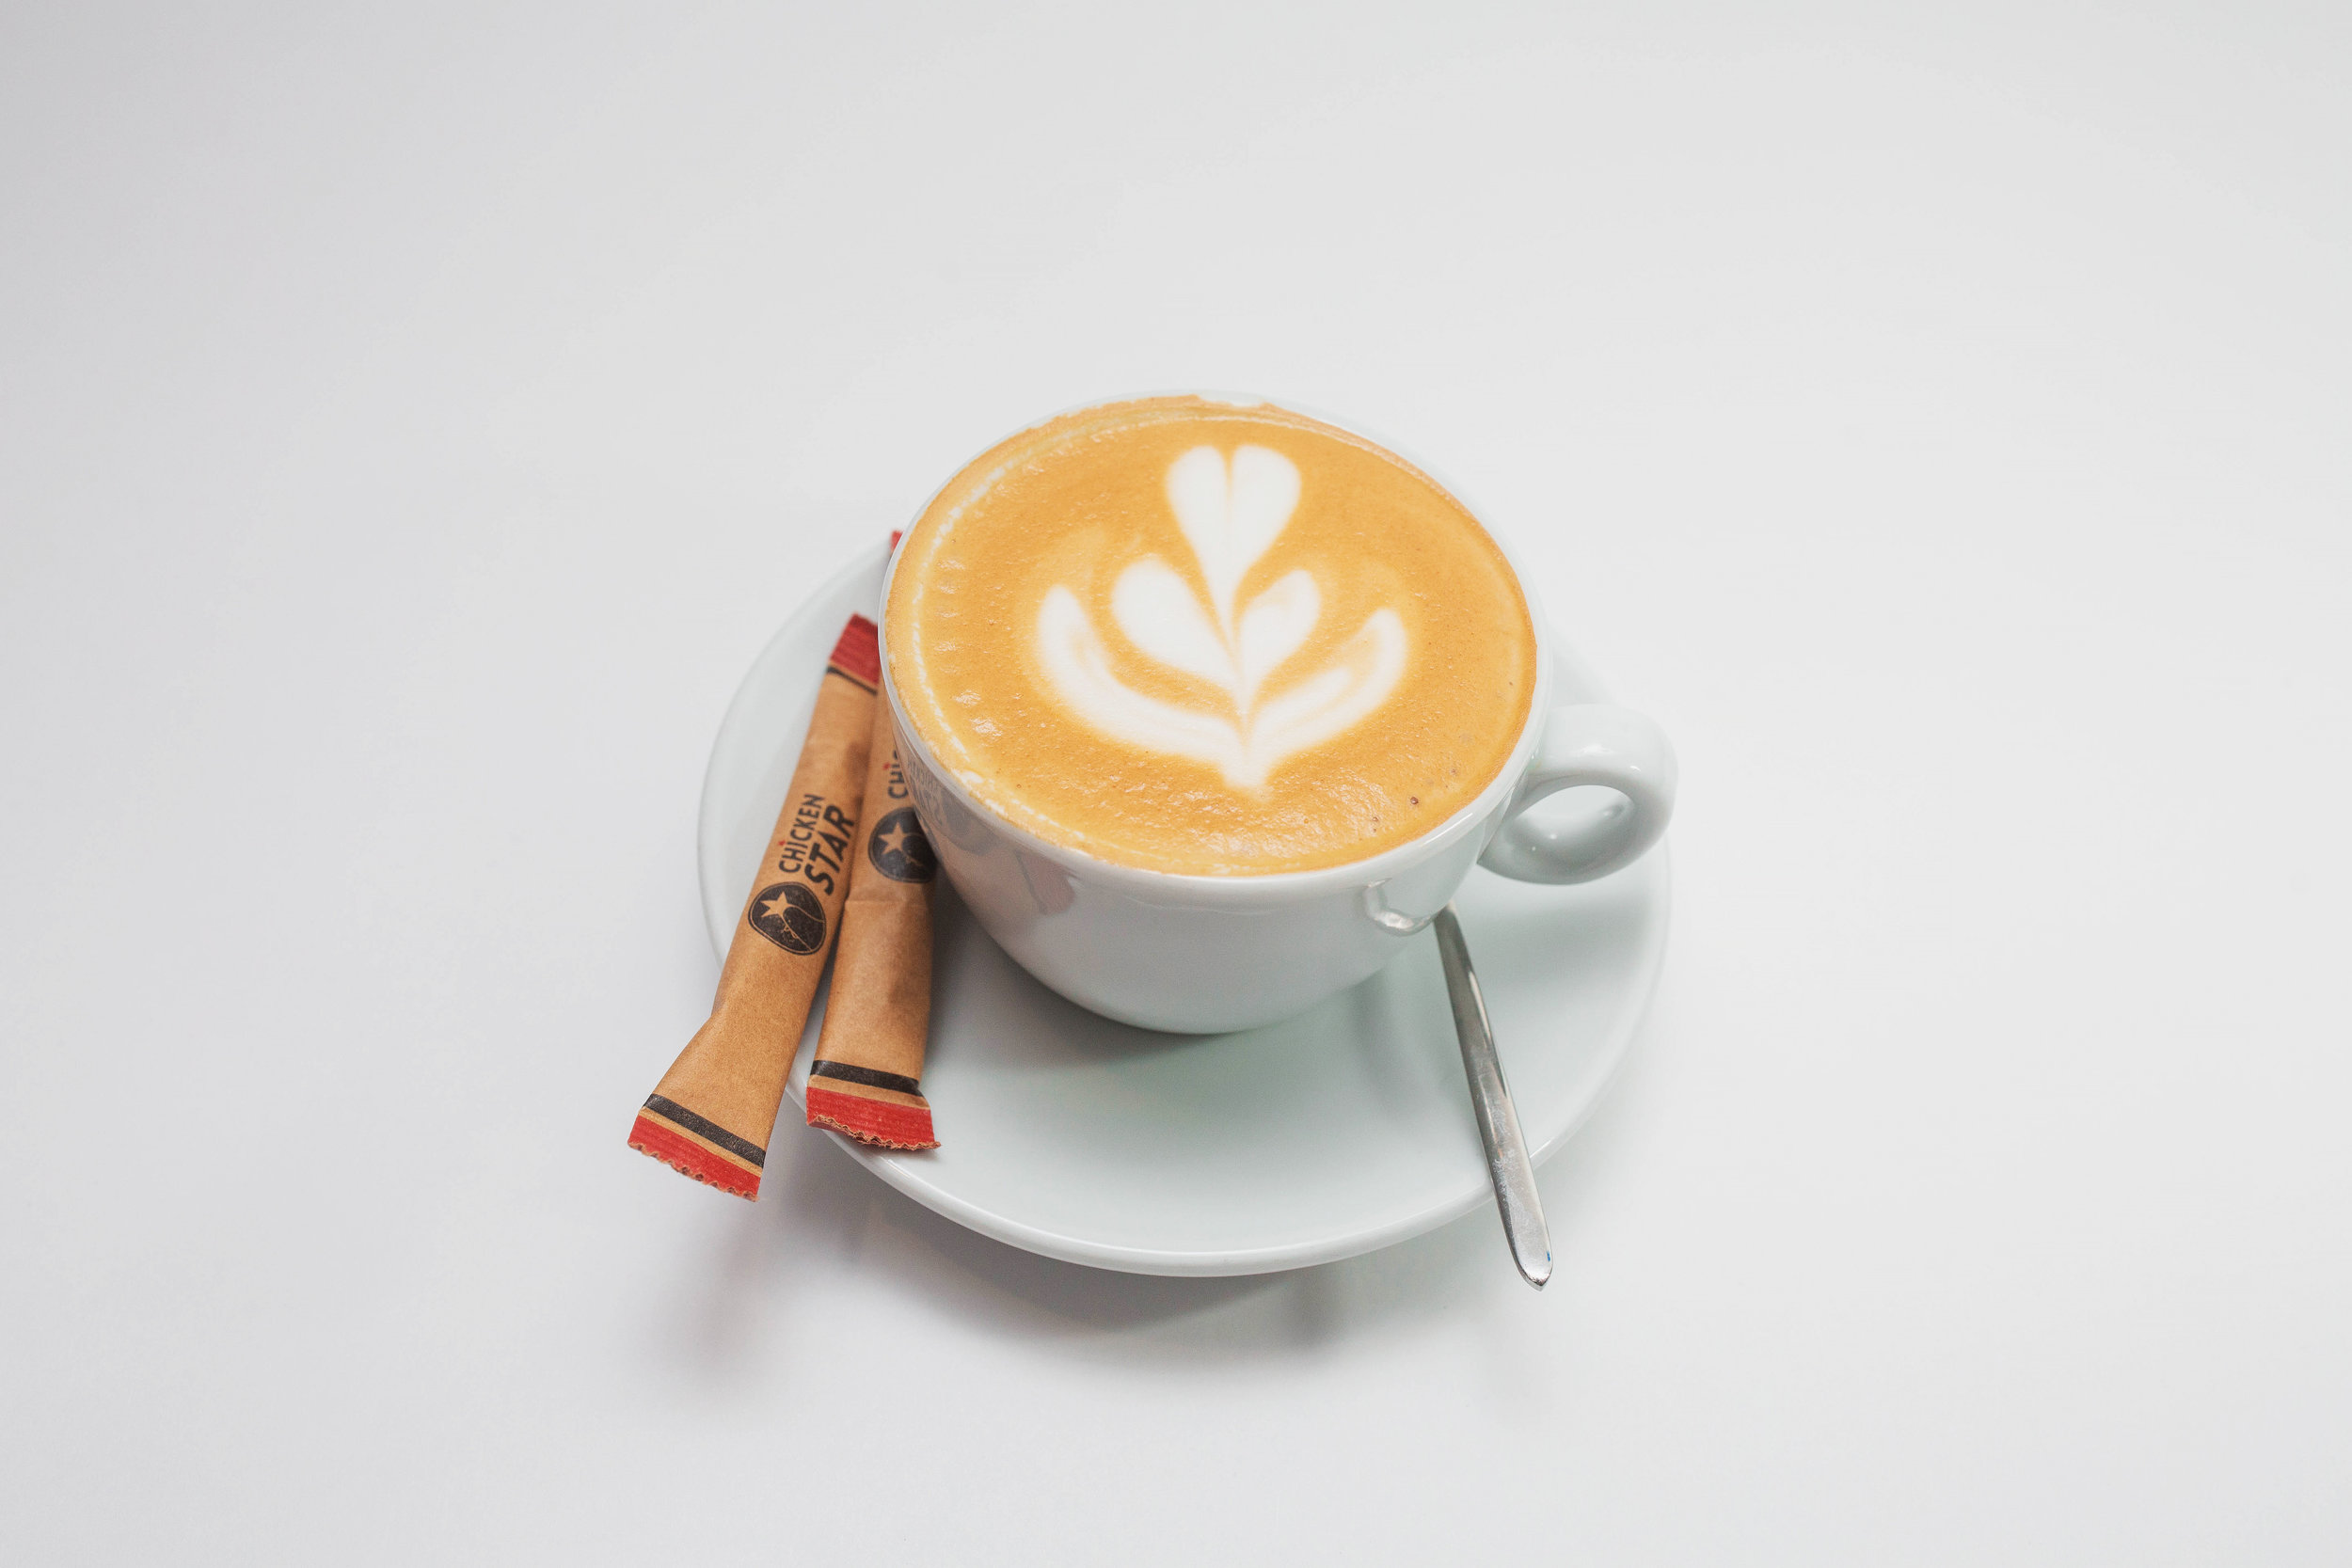 Cappuccino - Hot / Iced160 kgs / 190 kgs